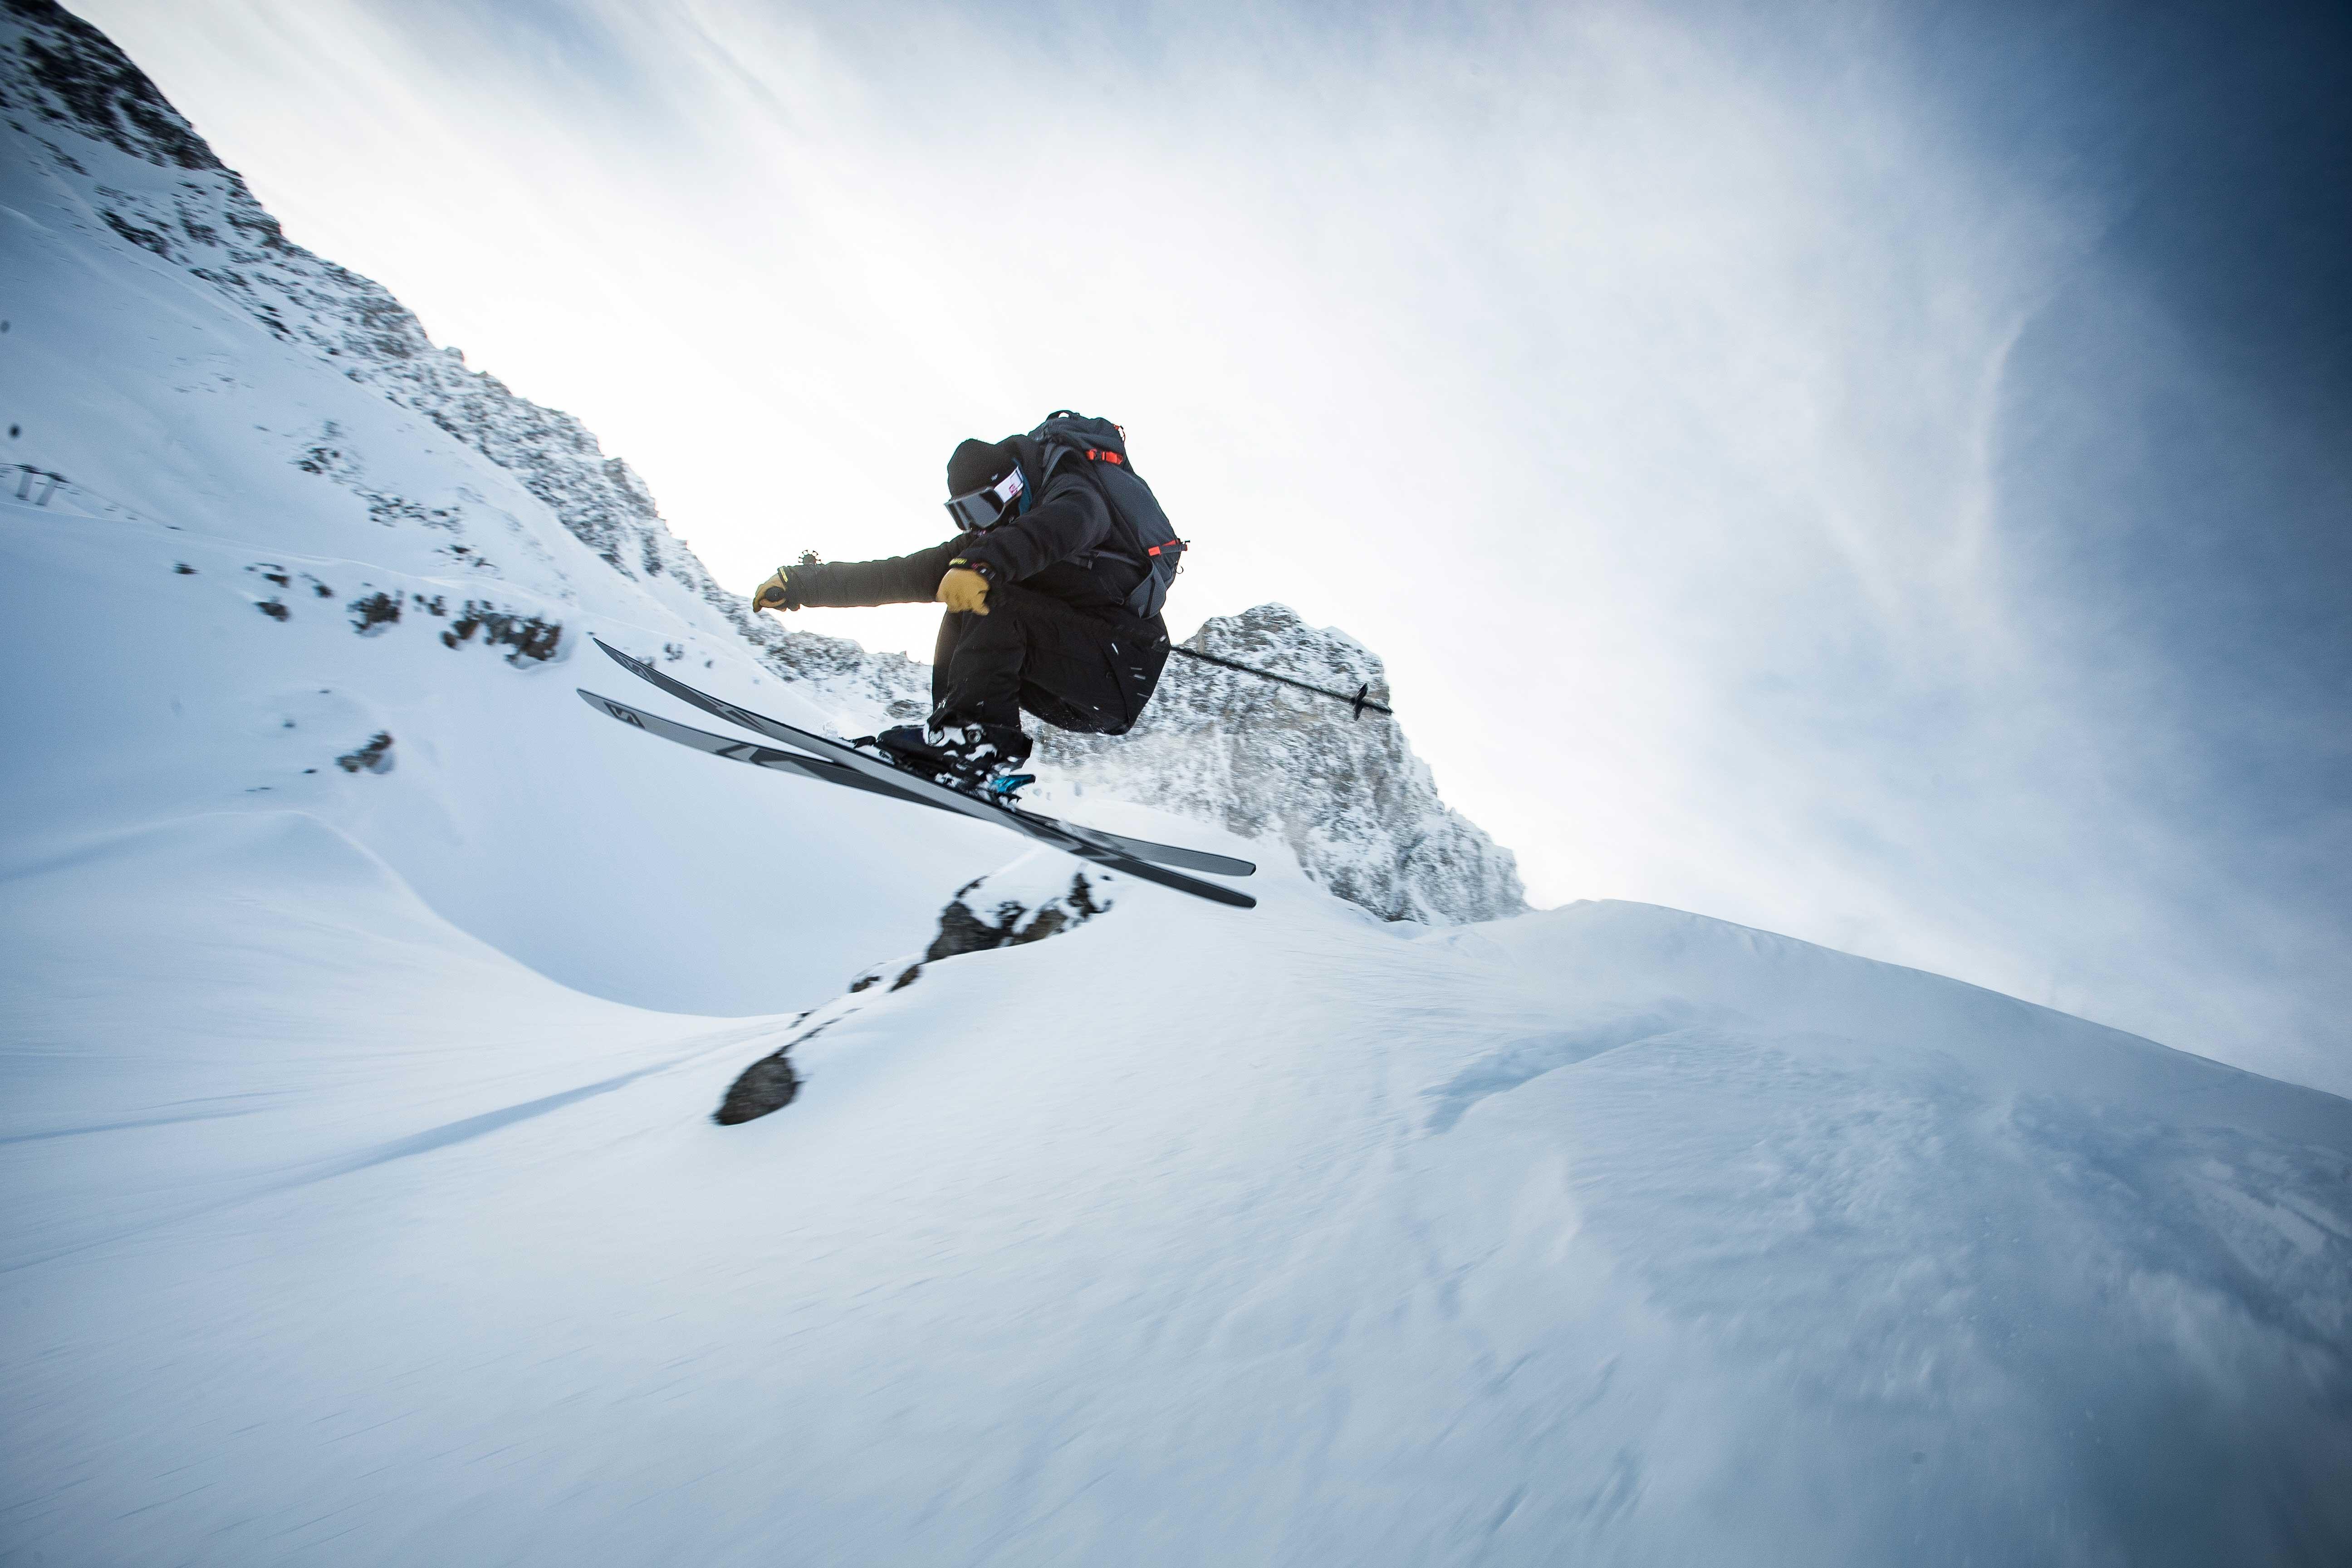 Salomon QST skis and Shift bindings | Sport Conrad Blog